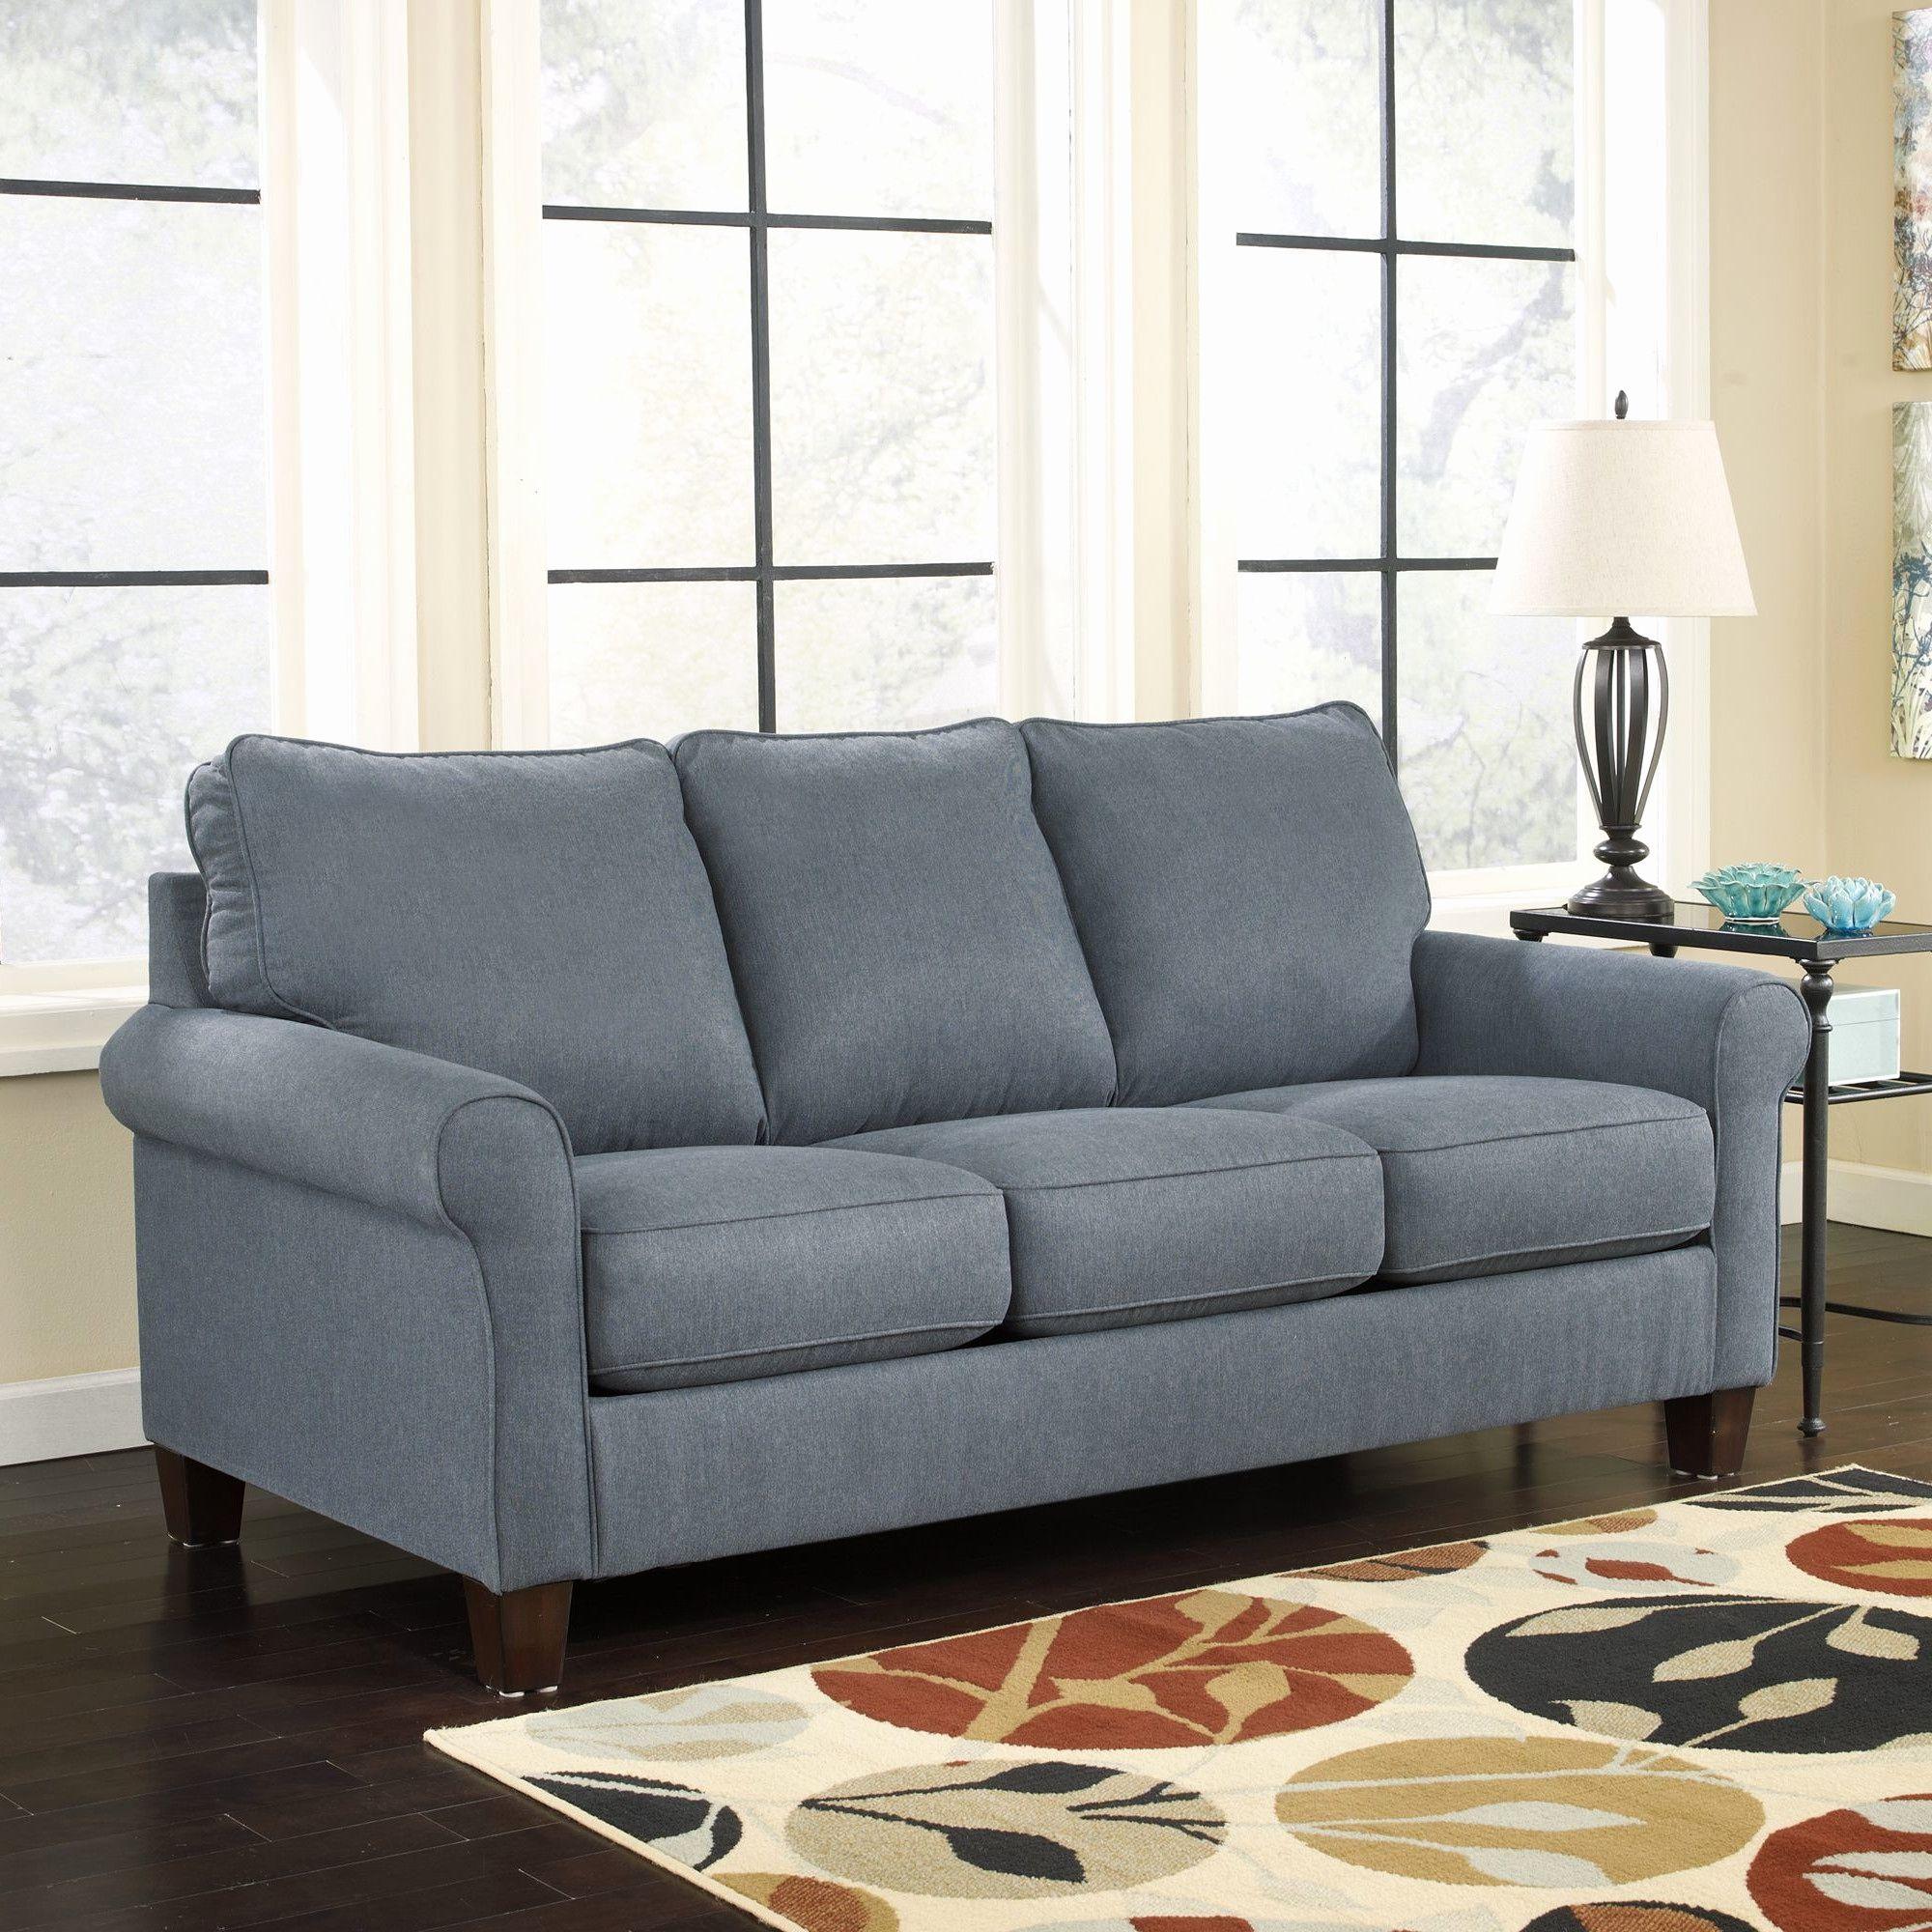 Lightweight Sofas Cushion Sofa Set Models Sleeper Baci Living Room